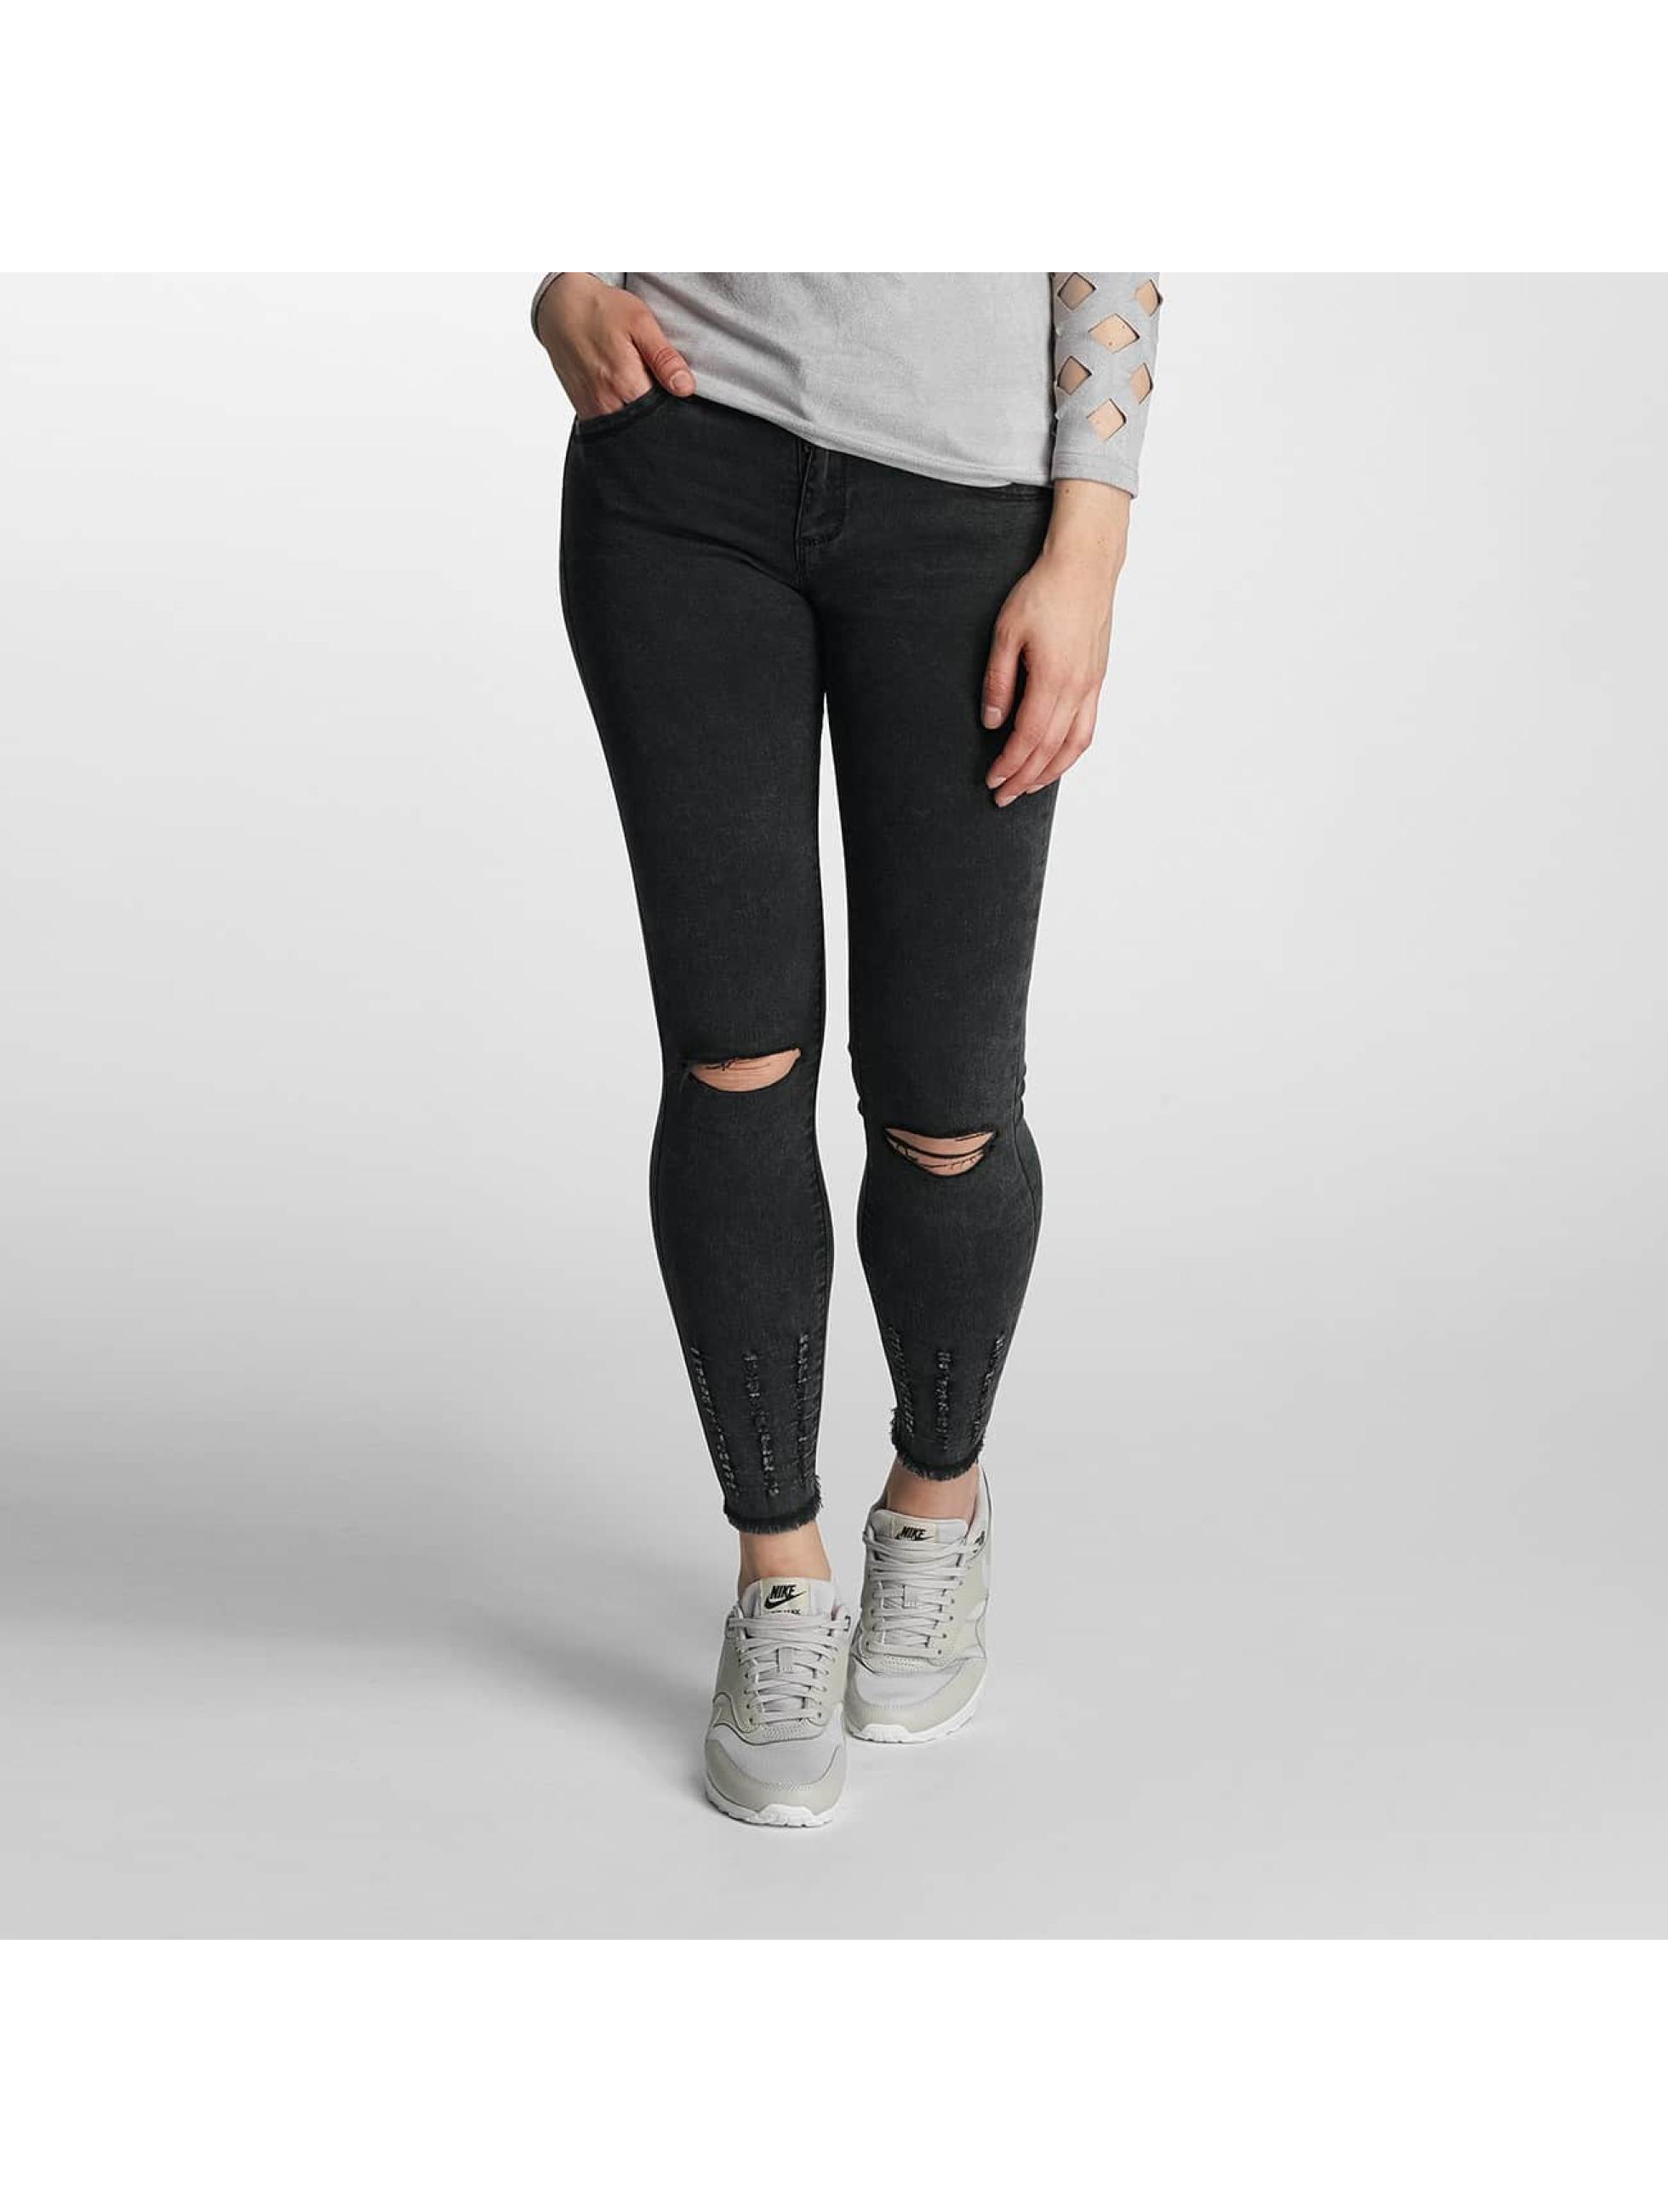 Paris Premium Denim noir Jean skinny femme